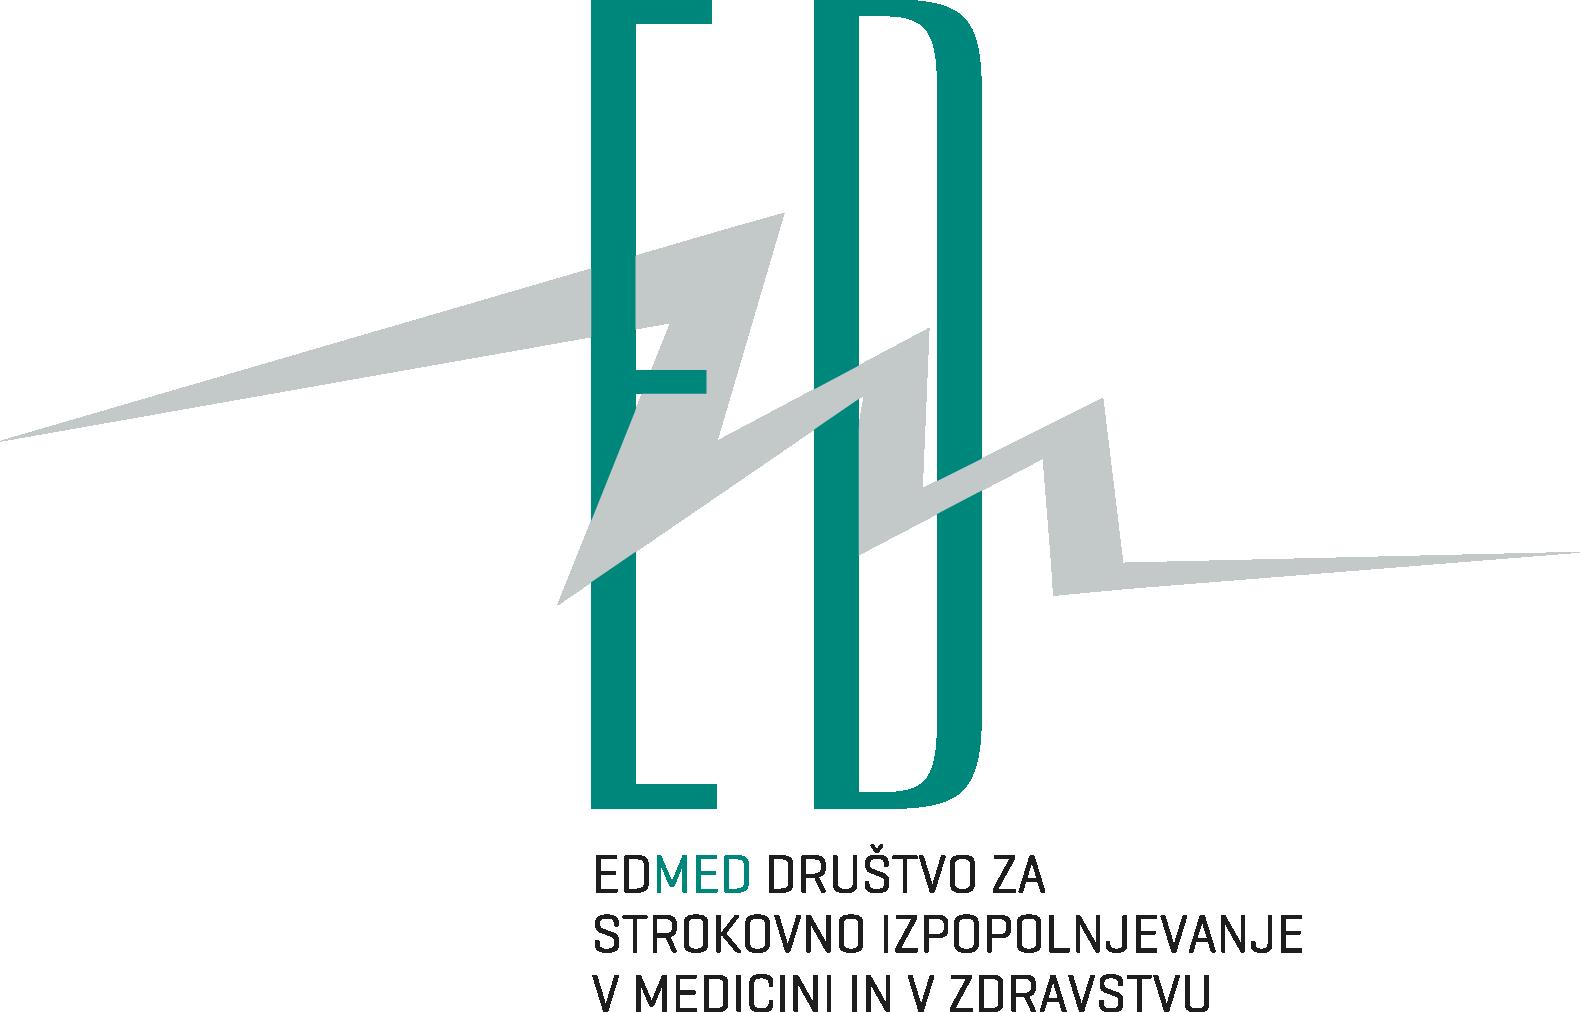 Društvo EDMED